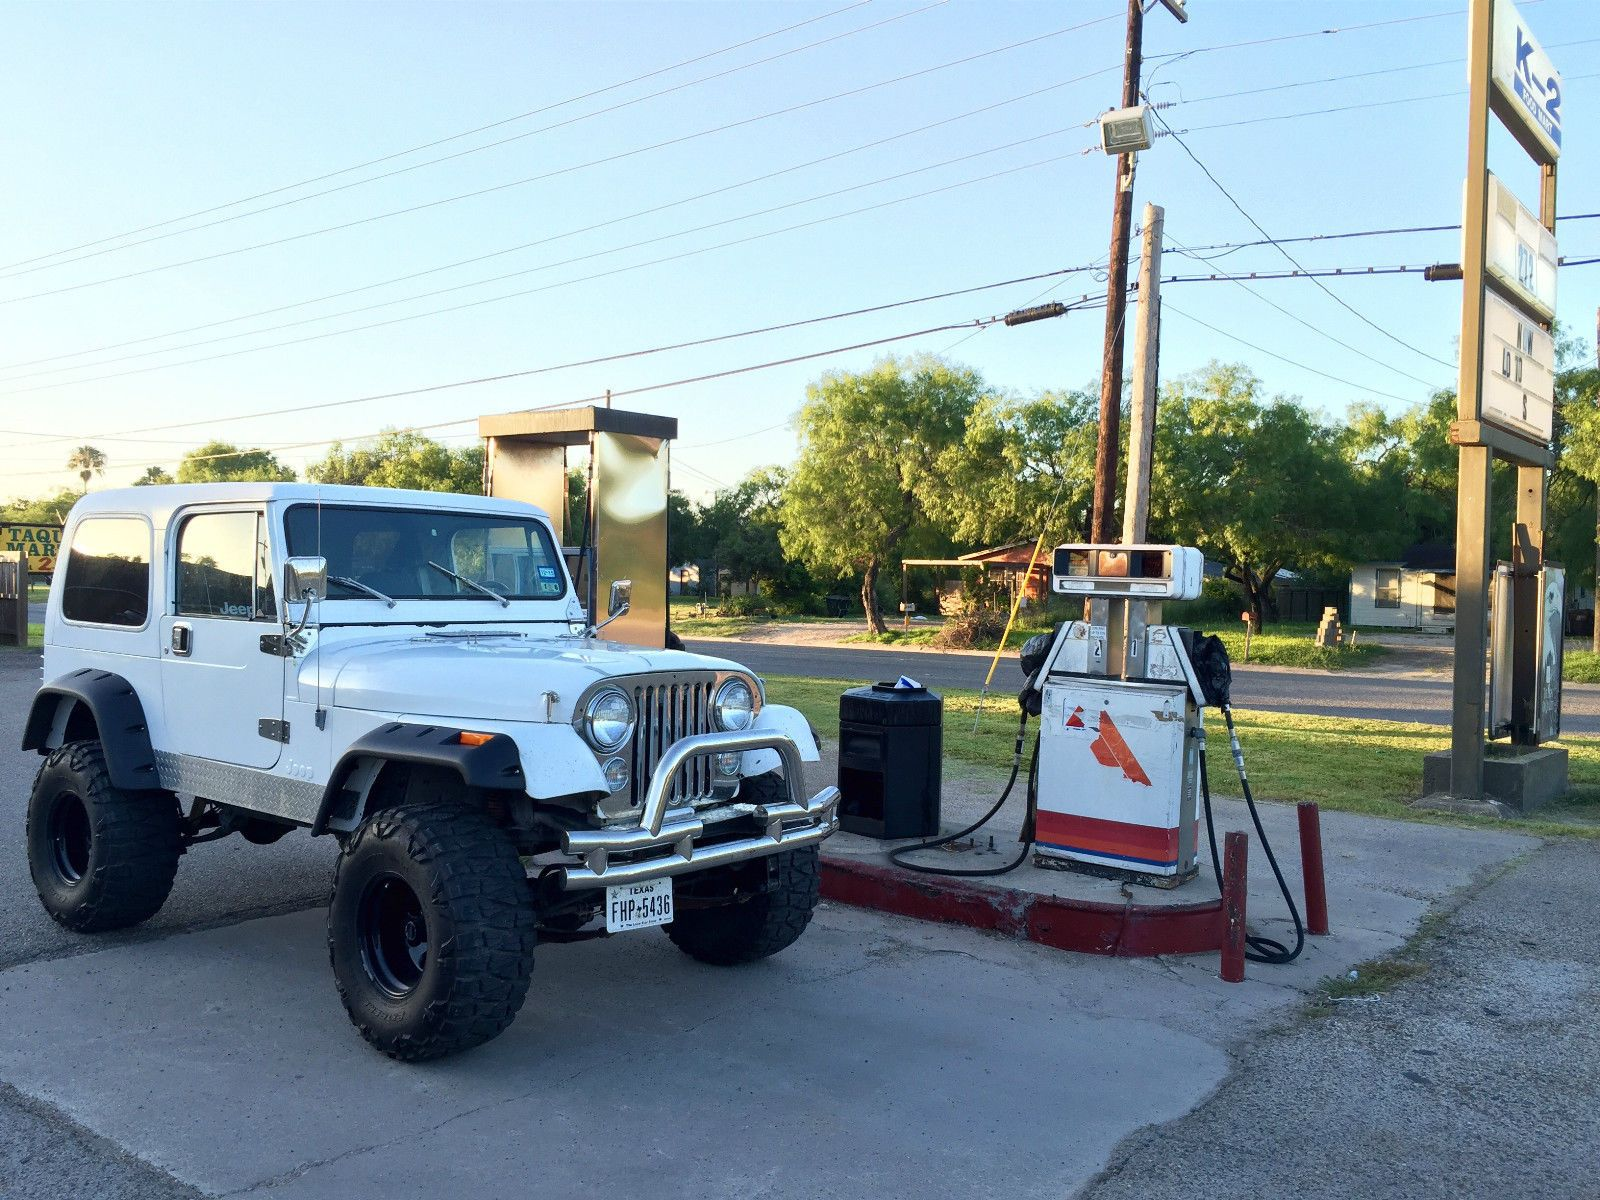 US $18,500.00 Used in eBay Motors, Cars & Trucks, Jeep | CJ ...